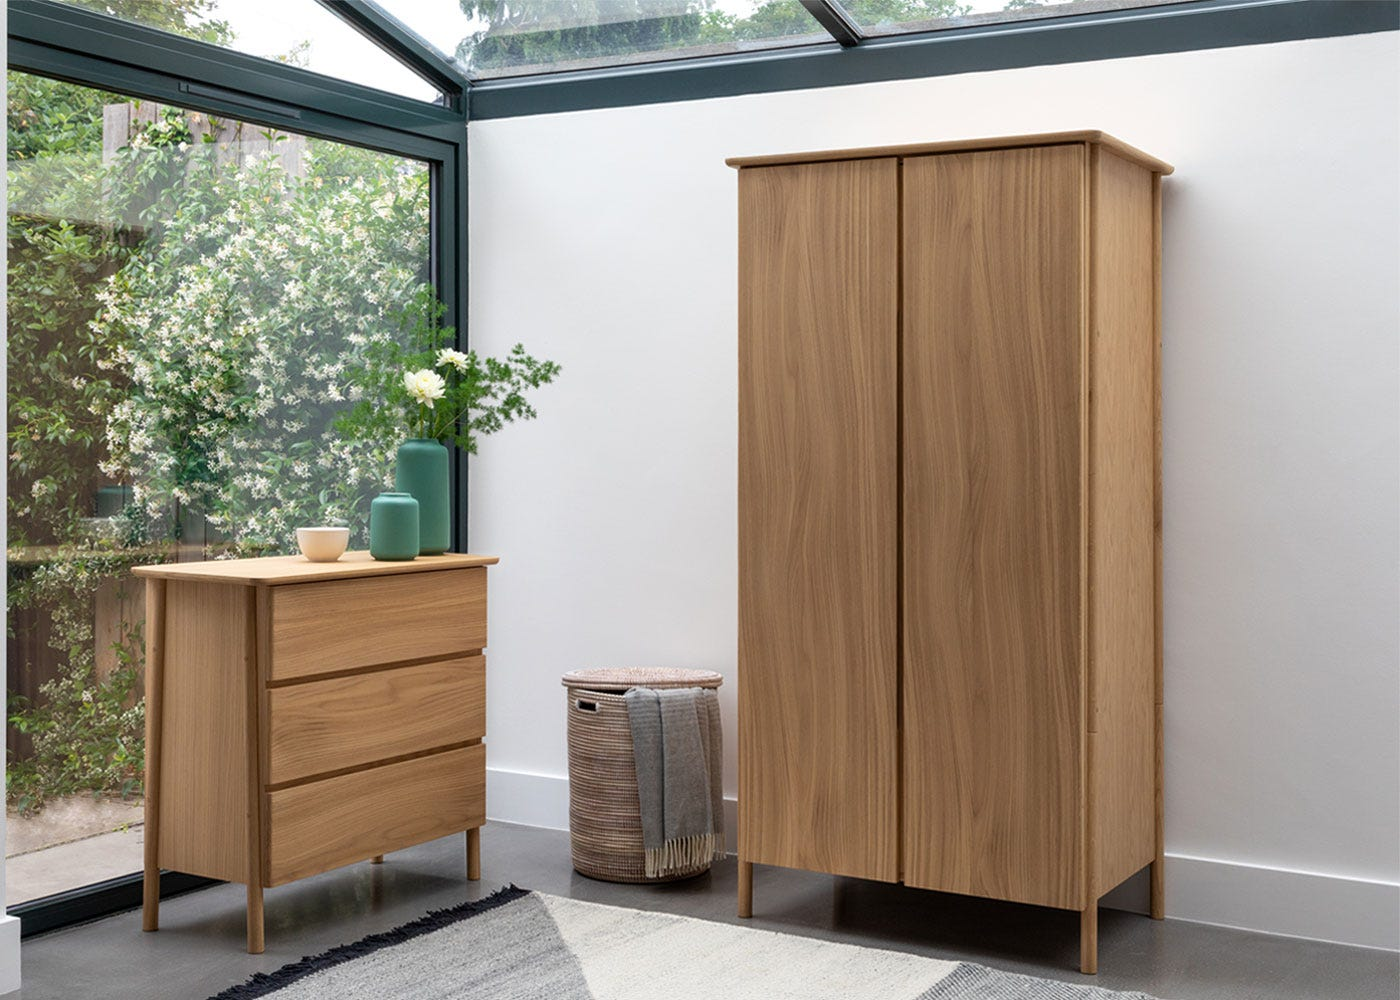 As shown: Eden chest and wardrobe.